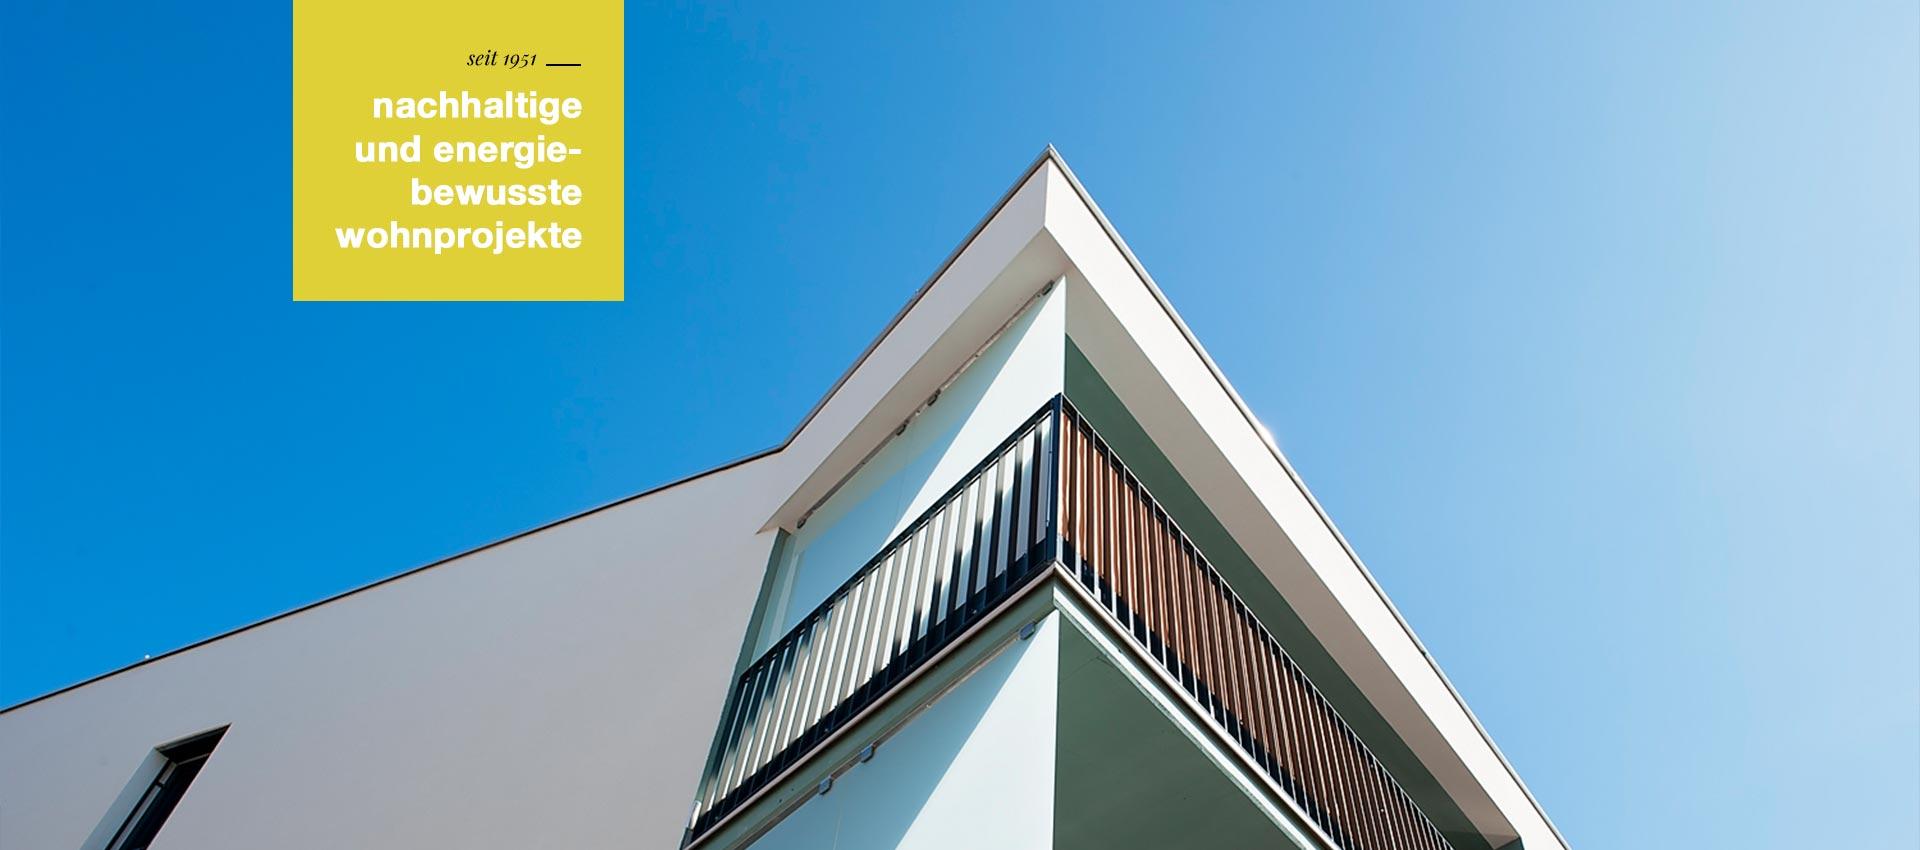 Kärntnerland Wohnprojekte